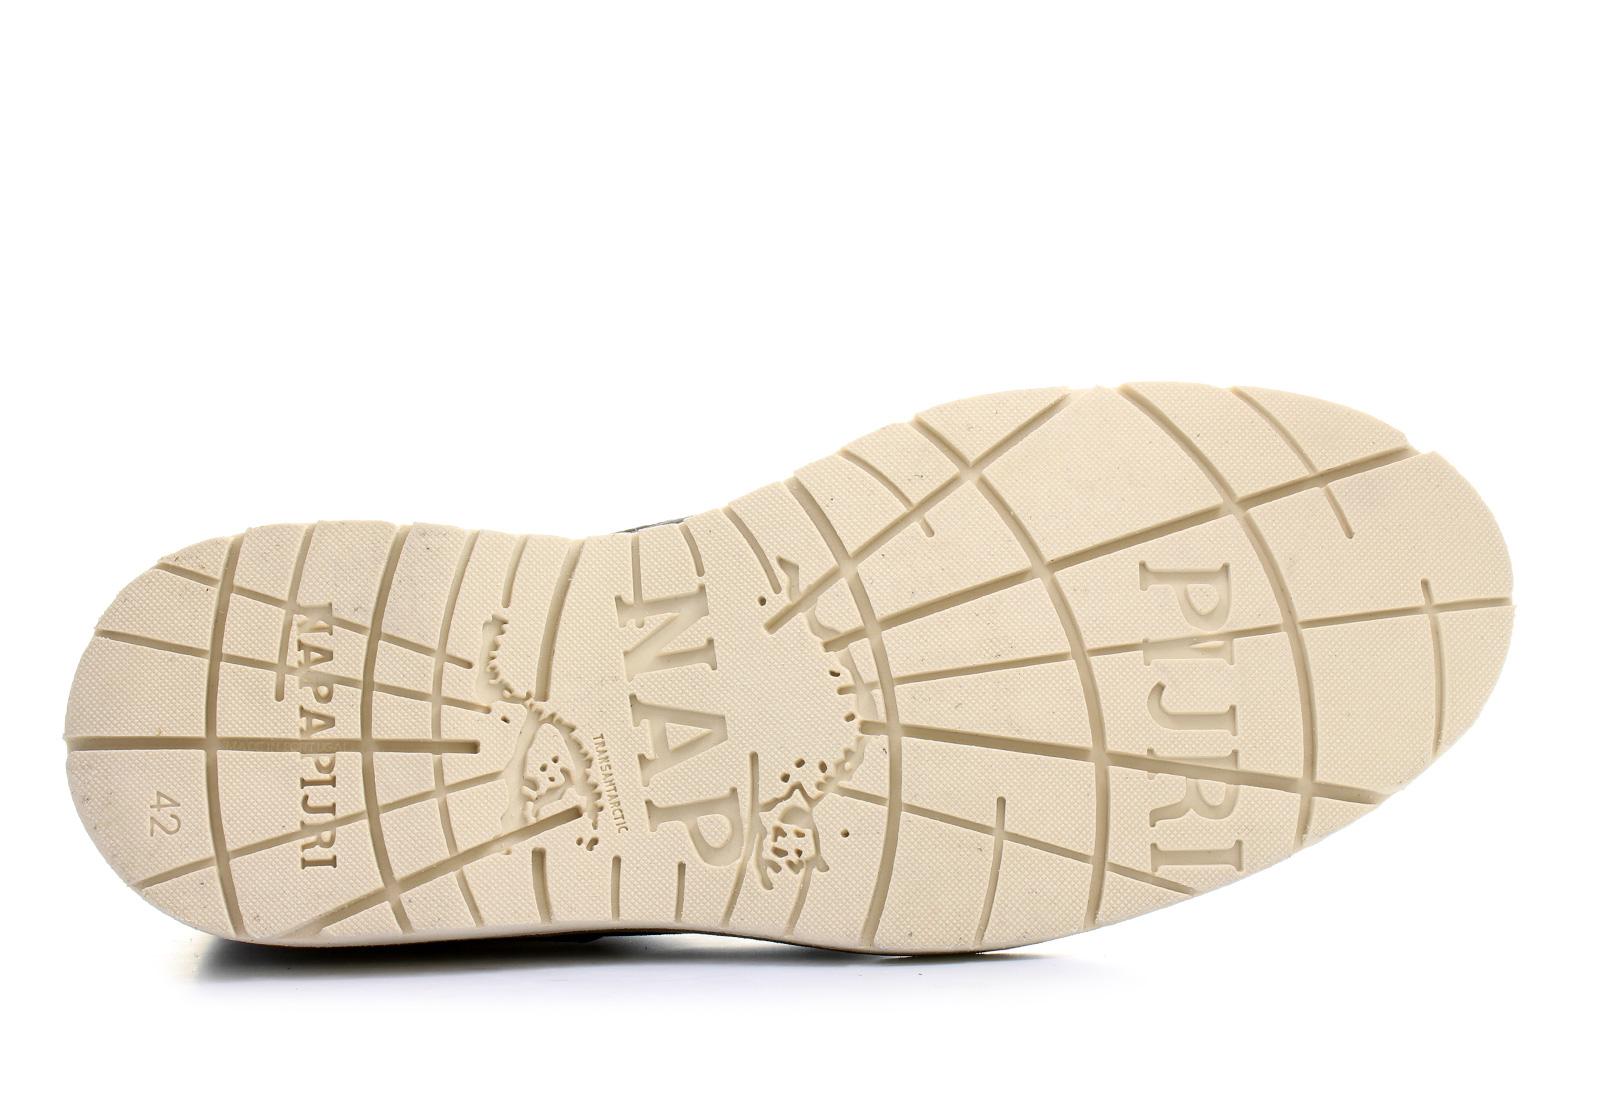 Online Napapijri For Shop N65 Boots And Trygve SneakersShoes 13843523 UMpSqzV